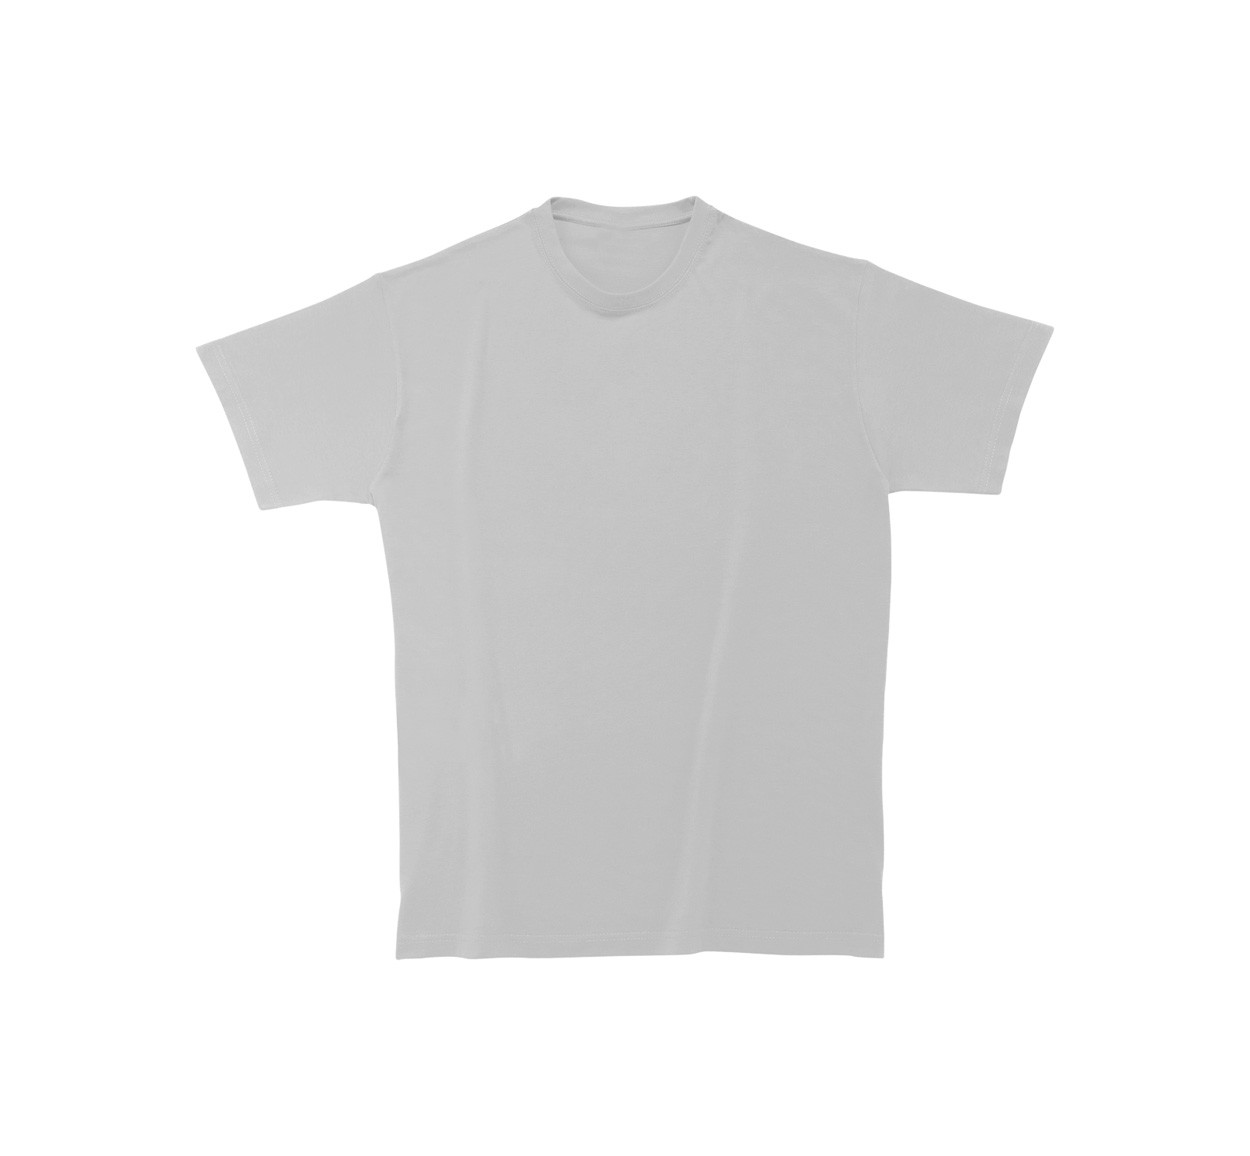 T-Shirt Heavy Cotton - White / XXL